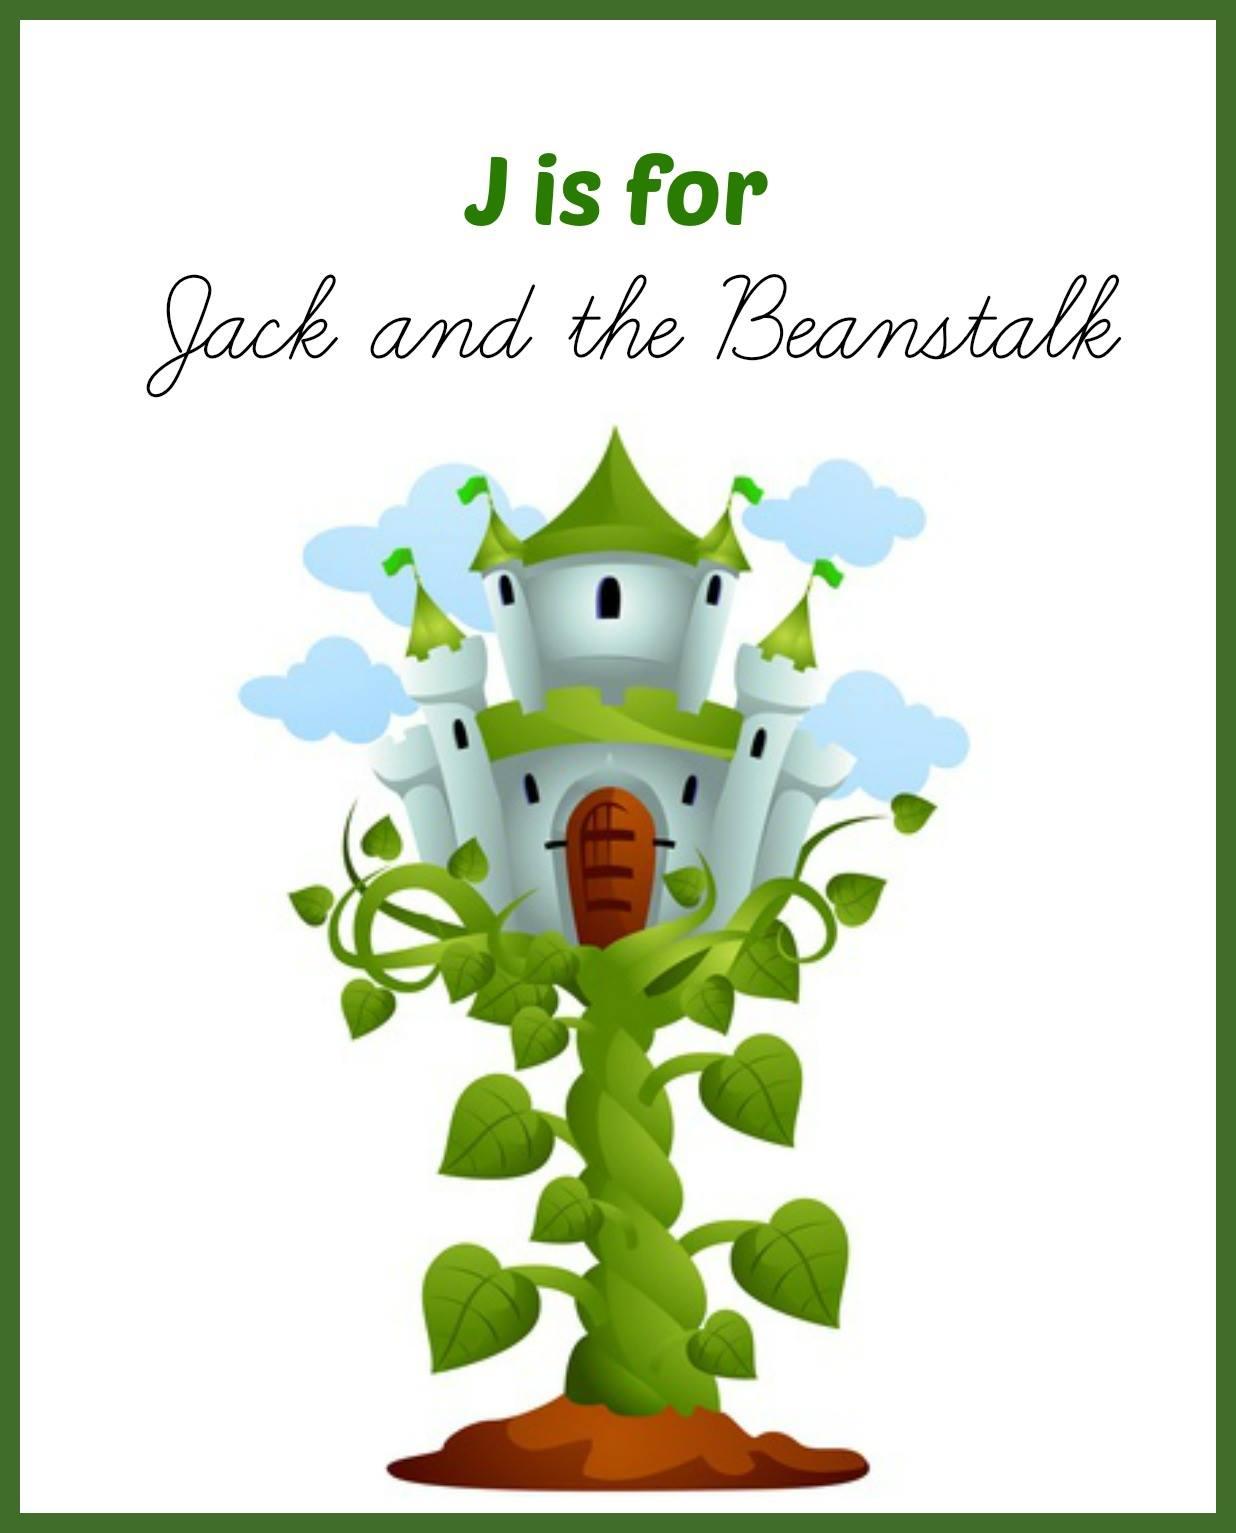 Letter J For Jack And The Beanstalk Enchantedyankee